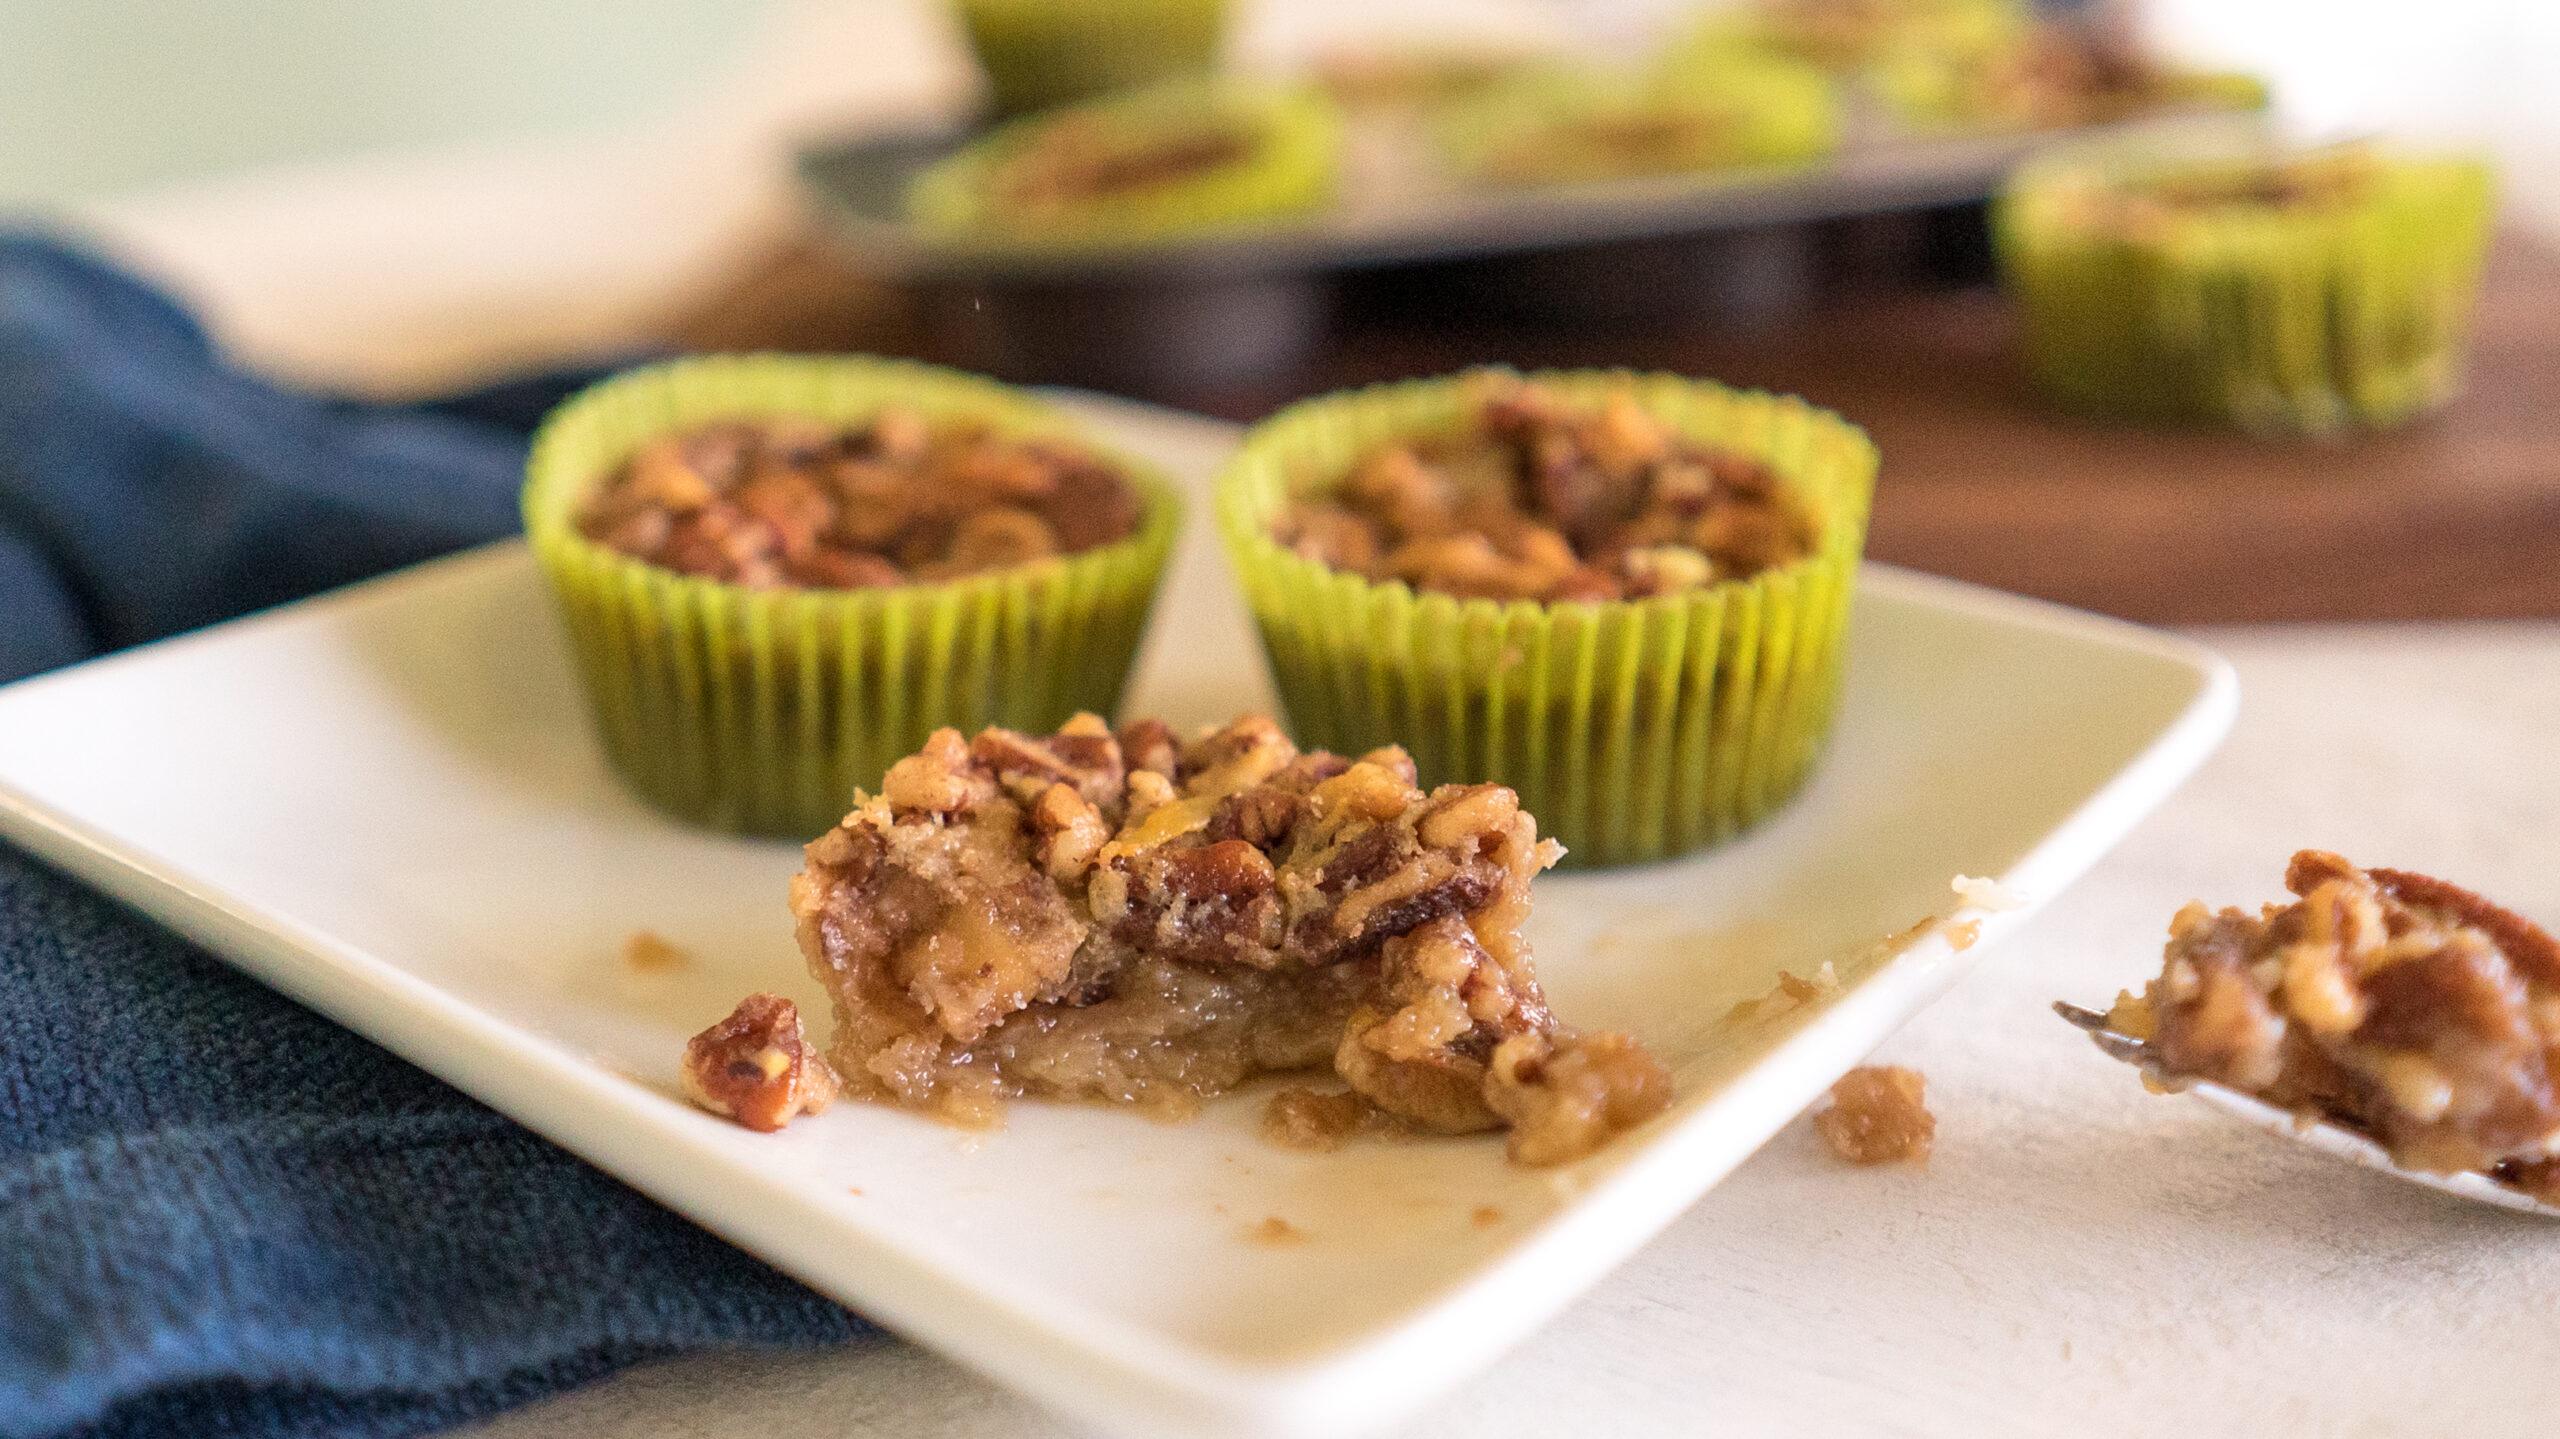 Gluten & Dairy-Free No Crust Mini Pecan Pies